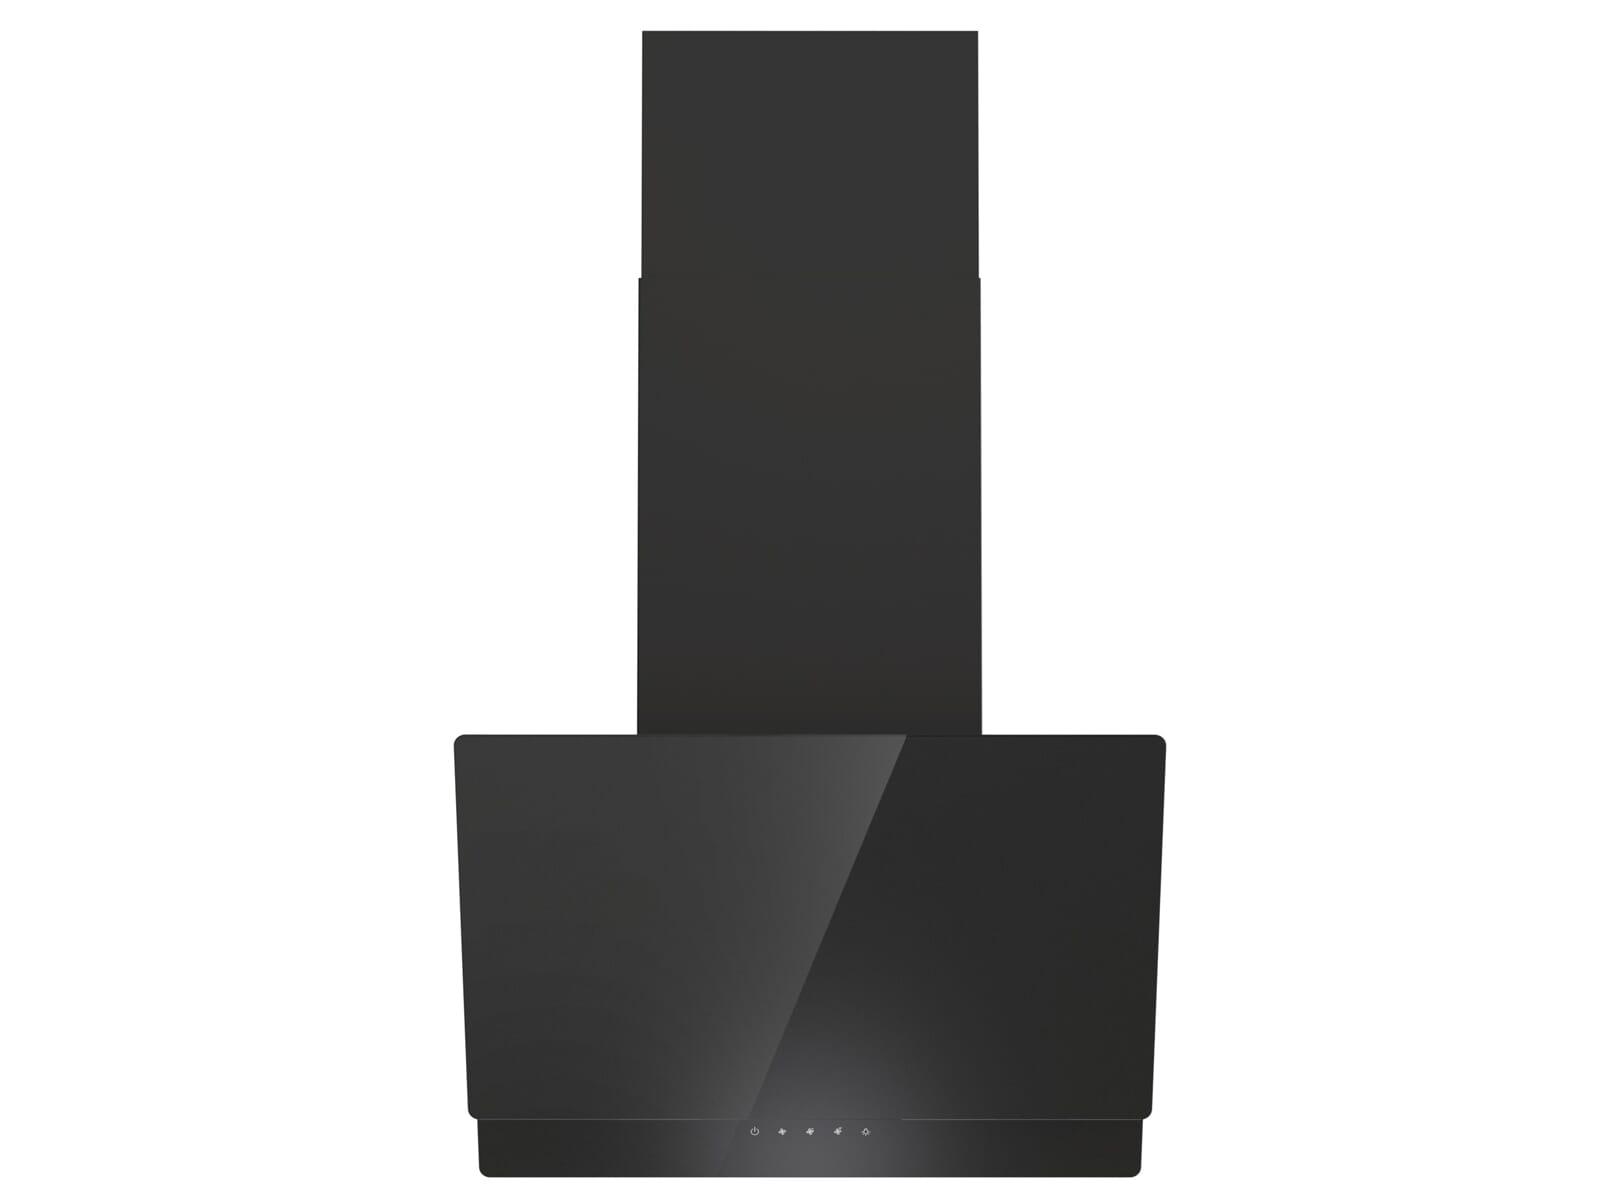 Gorenje W6TB Kopffreihaube 60 cm Schwarz